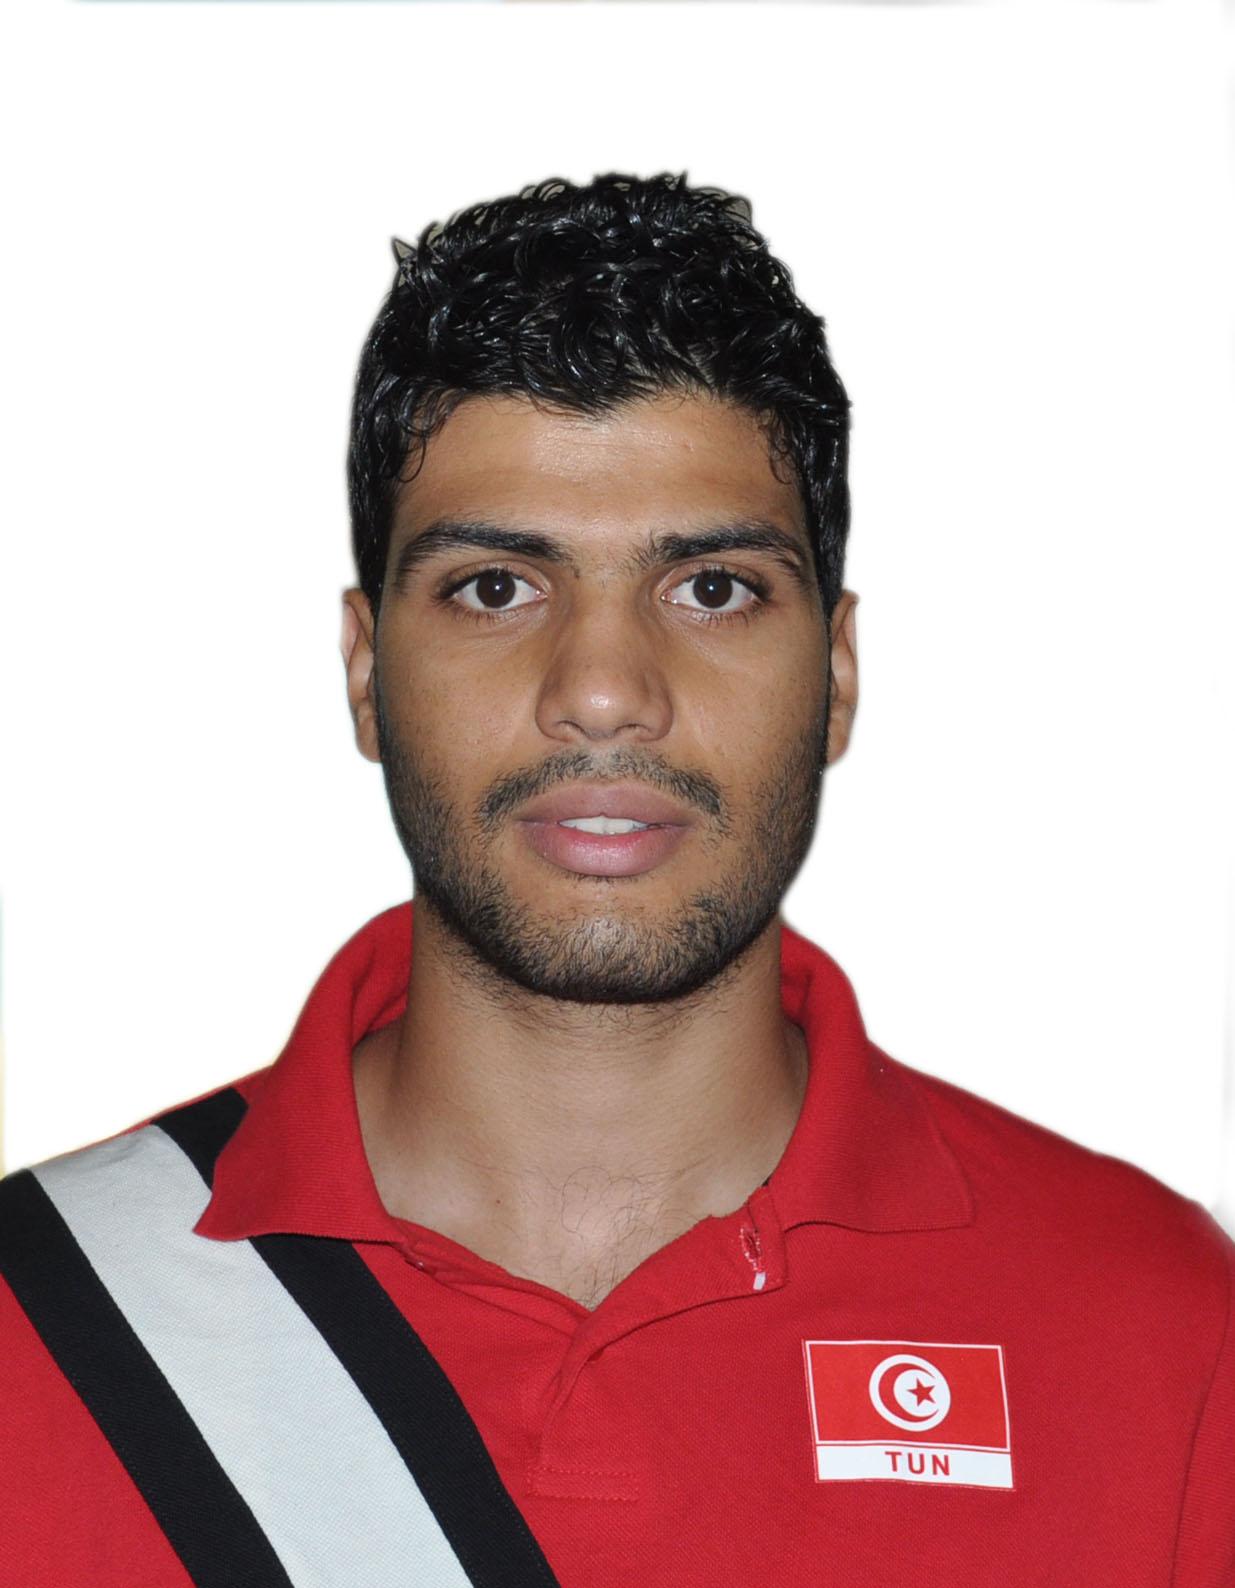 Omar Agrebi